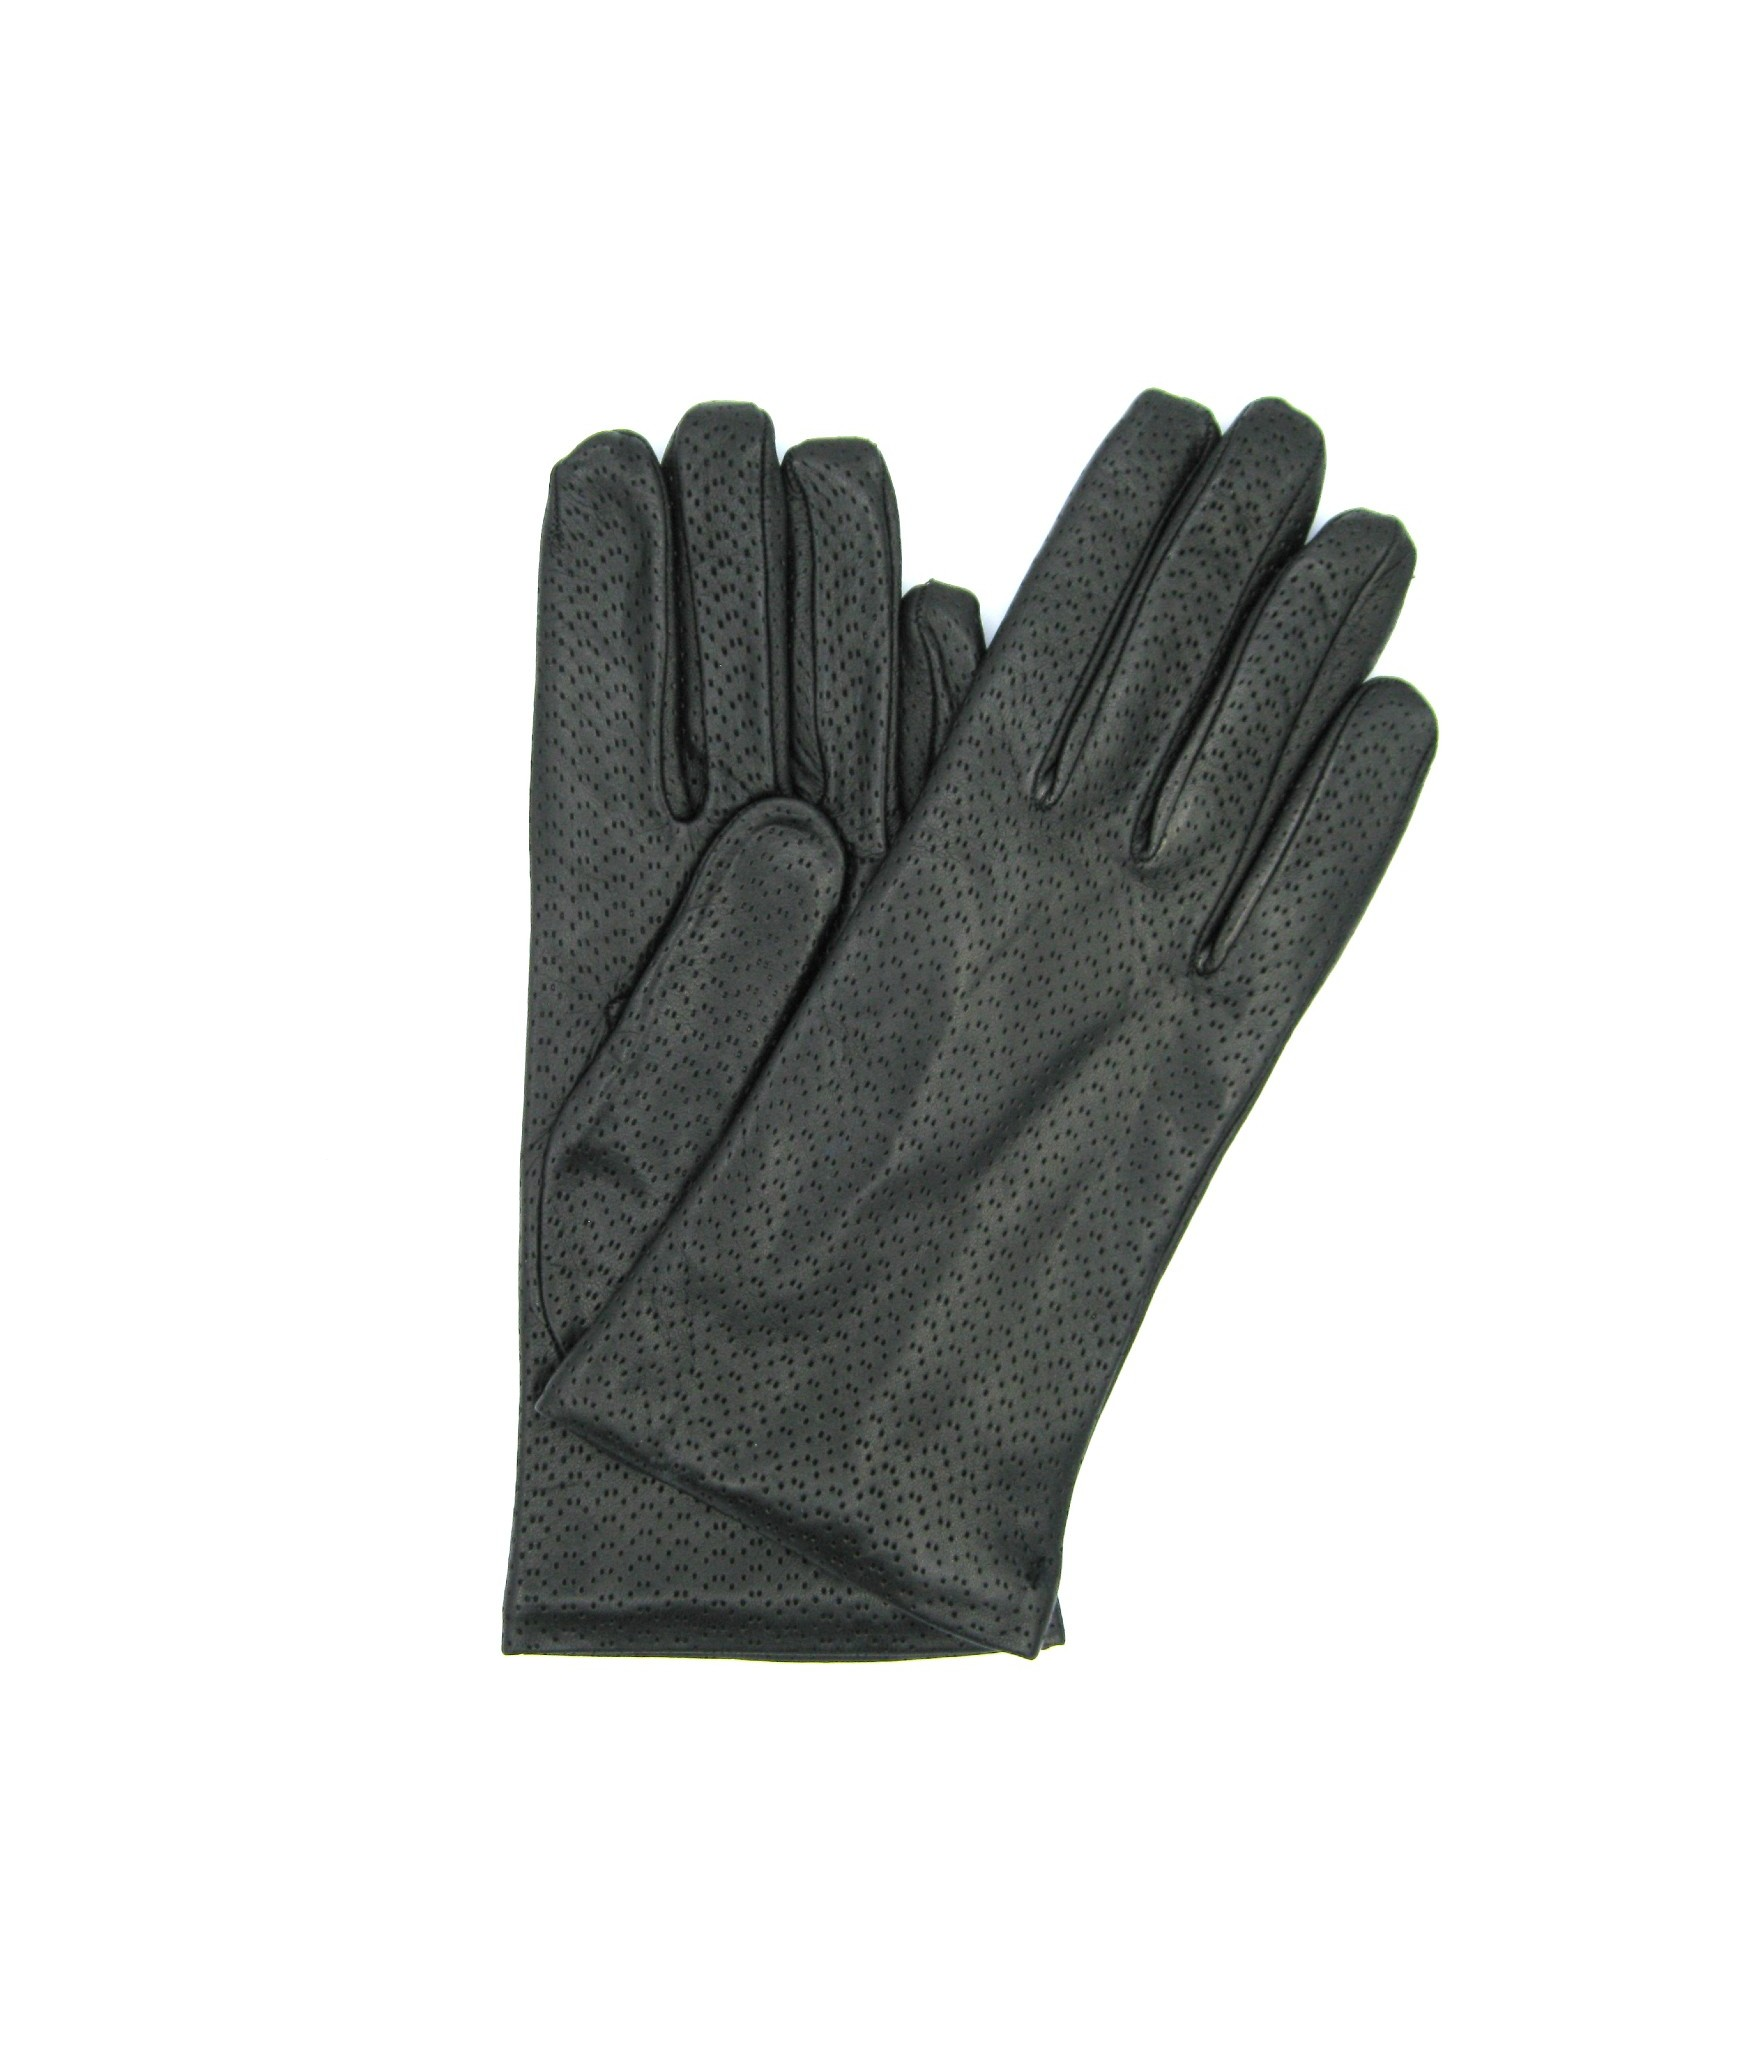 Nappa leather gloves 2bt,cashmere lined Black Sermoneta Gloves